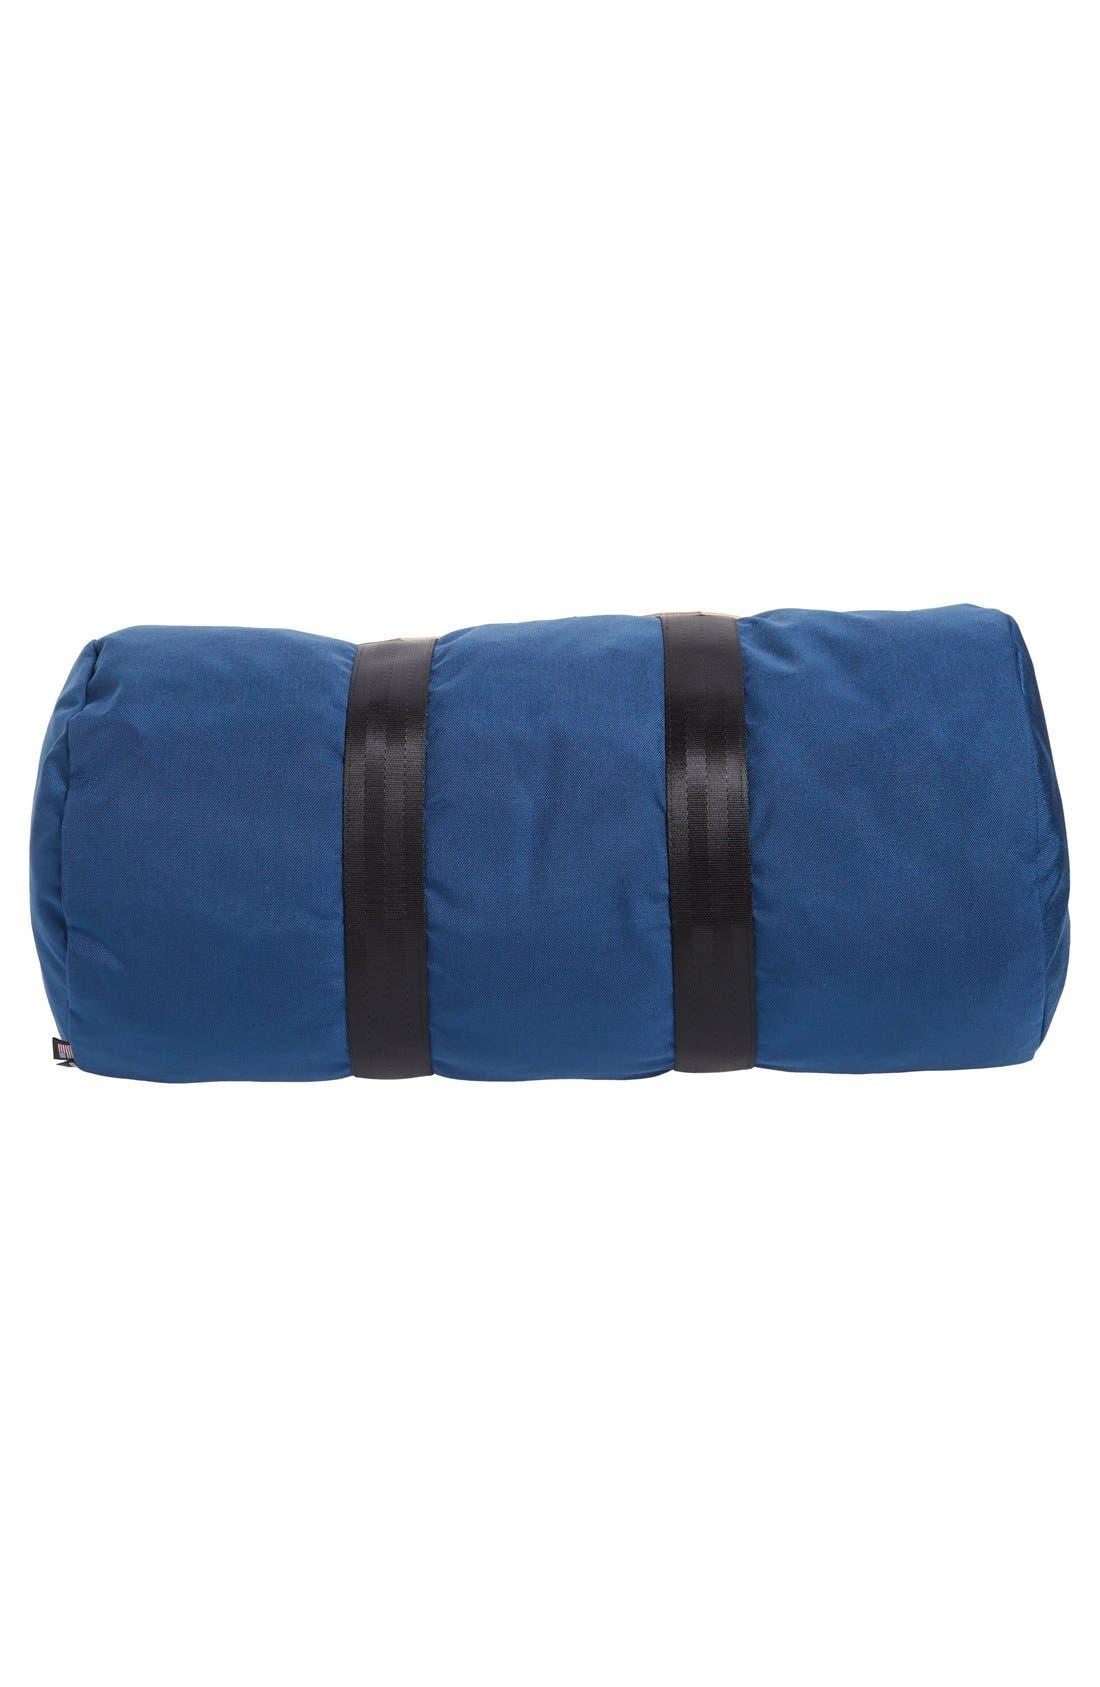 Classic Duffel Bag,                             Alternate thumbnail 6, color,                             Navy